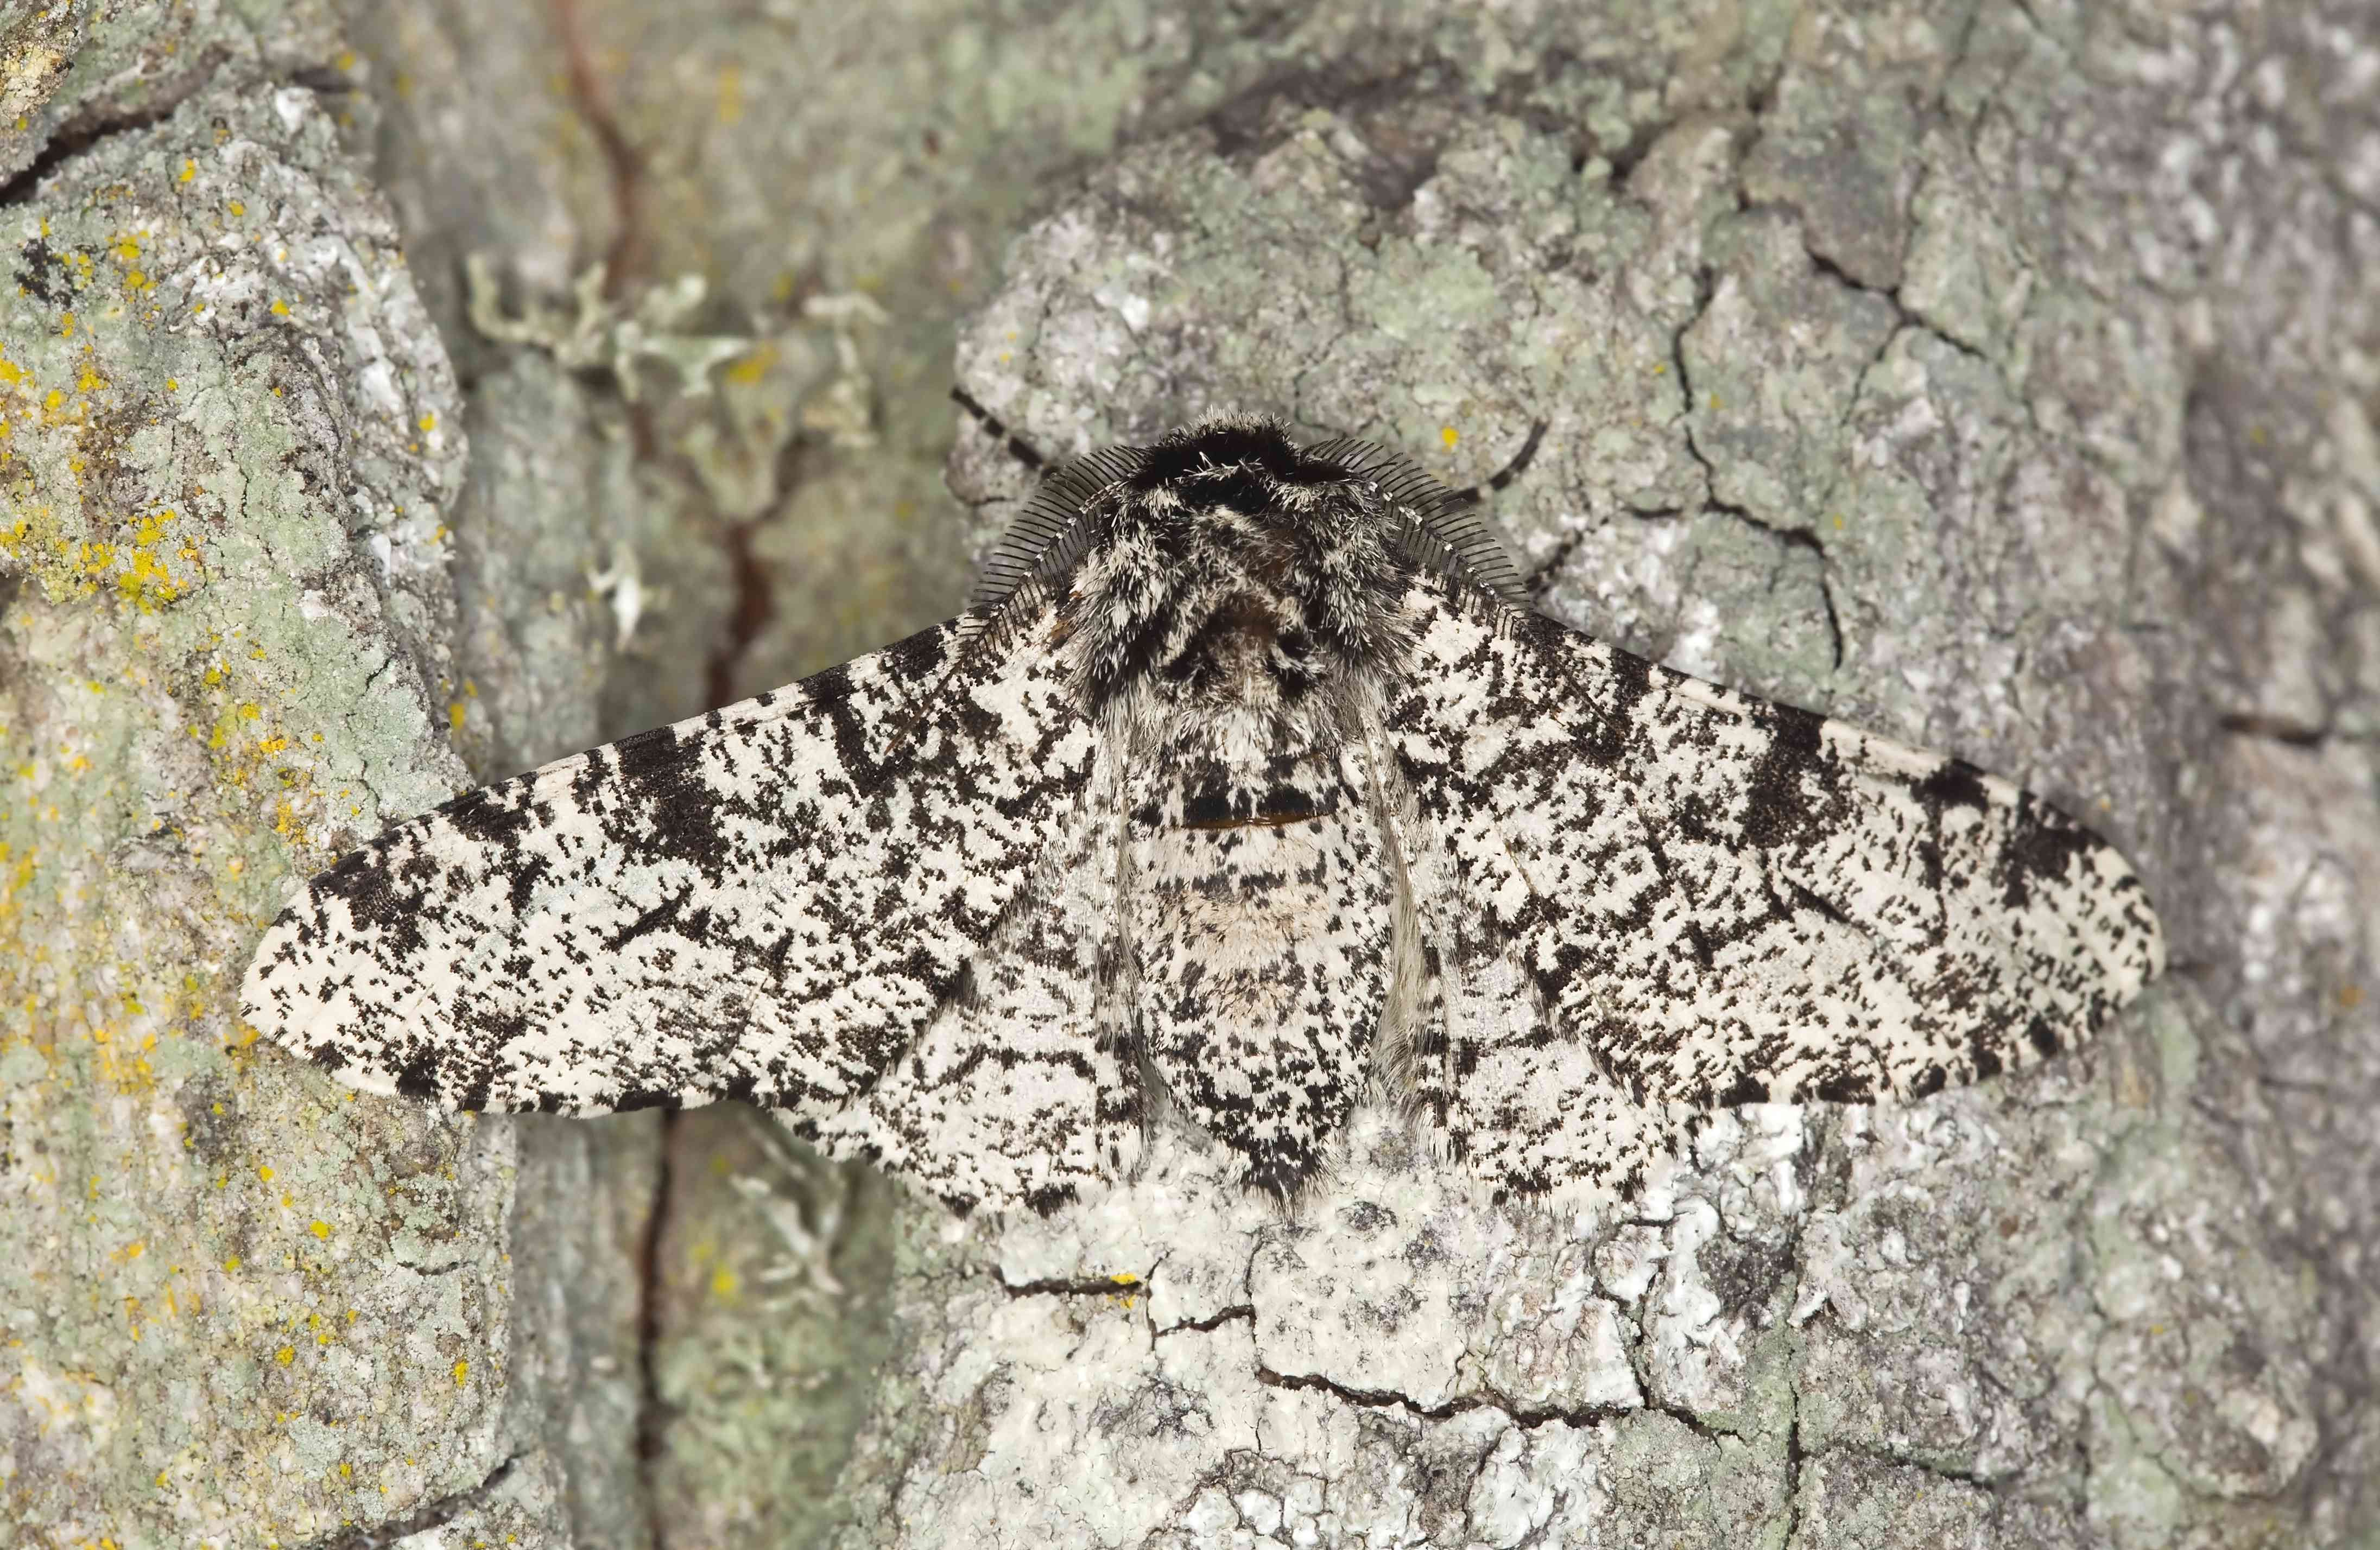 Peppered moth (Biston betularia) camouflaged on oak Macro photo.